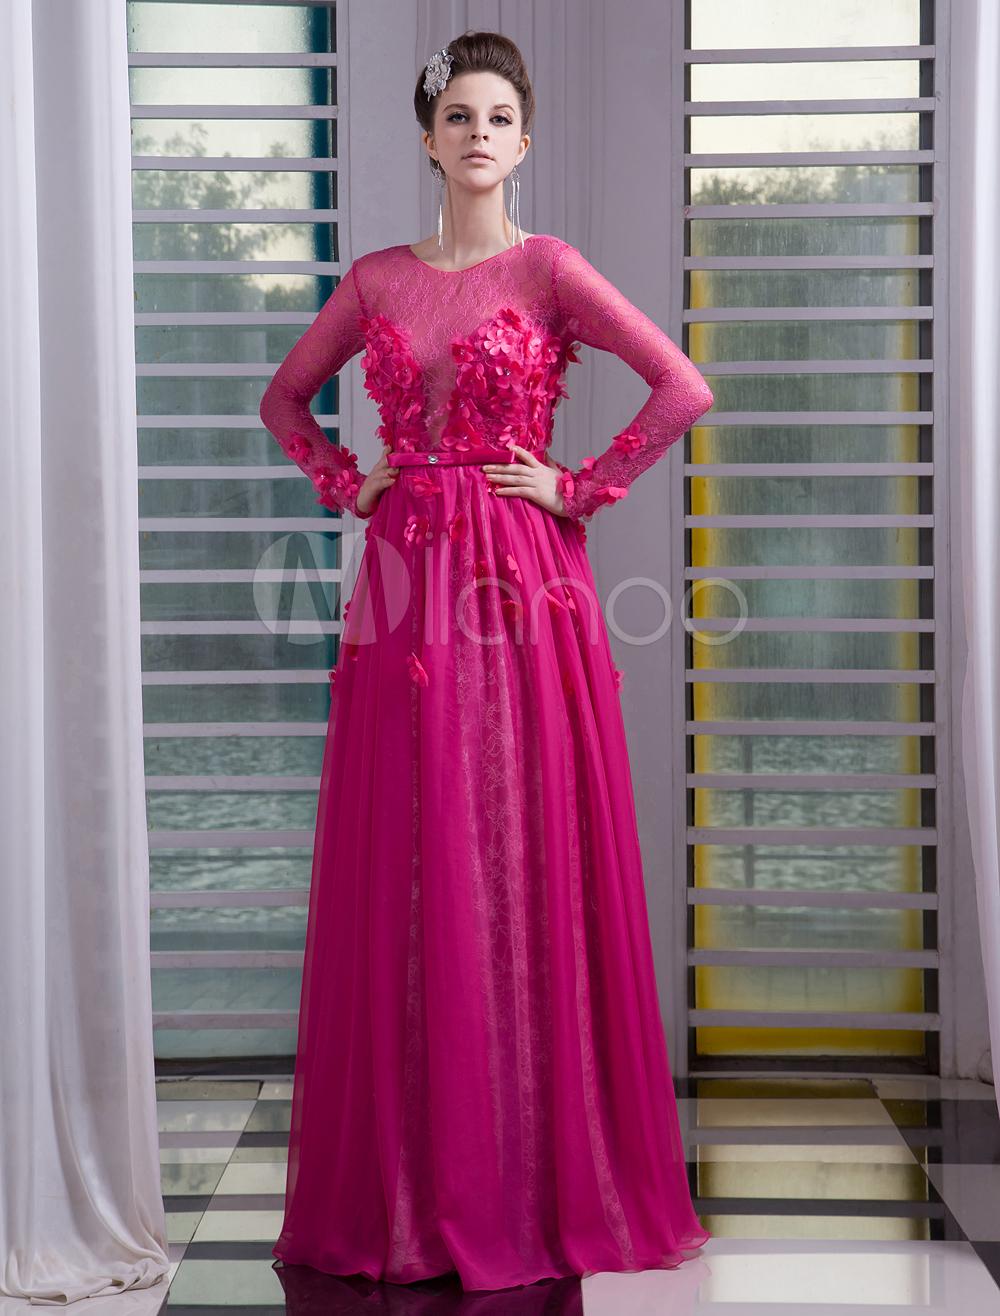 07a58d6fc0 Chiffon Evening Dress Illusion 3D Flower Beaded Prom Dress Hot Pink Jewel  Neck Long Sleeves A Line Floor Length Party Dress Milanoo  Prom